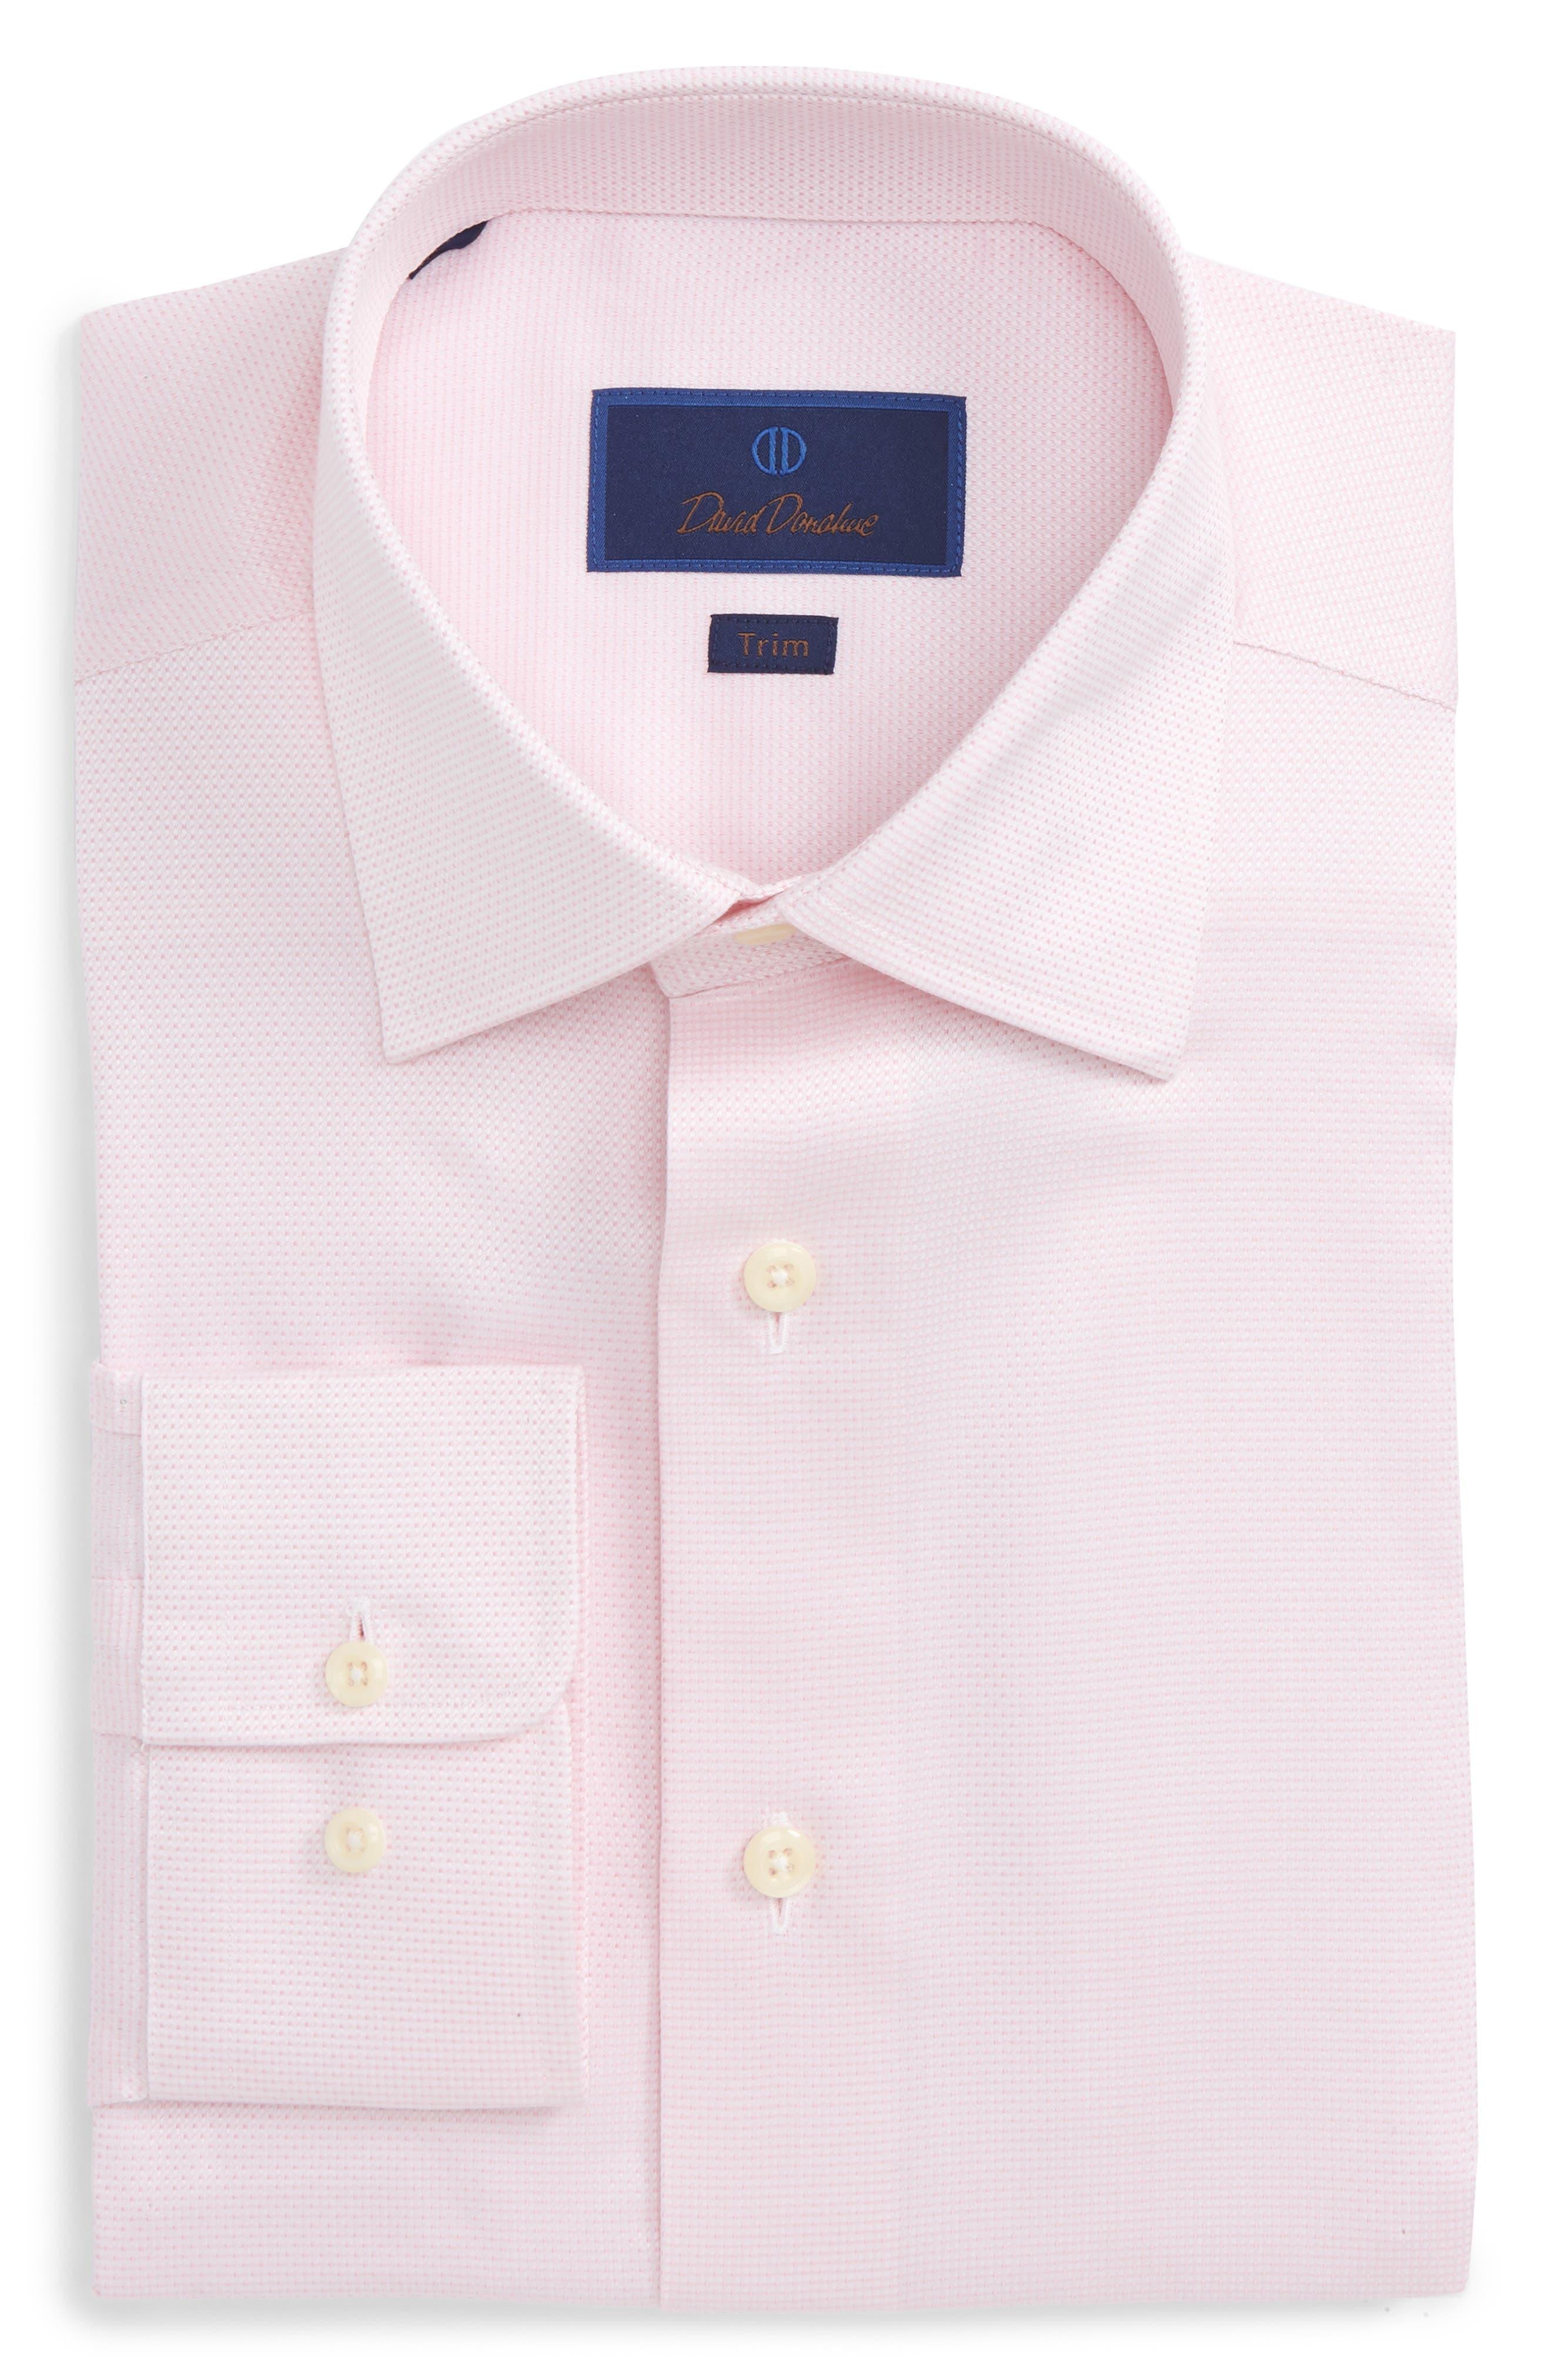 Alternate Image 1 Selected - David Donahue Trim Fit Microdot Dress Shirt